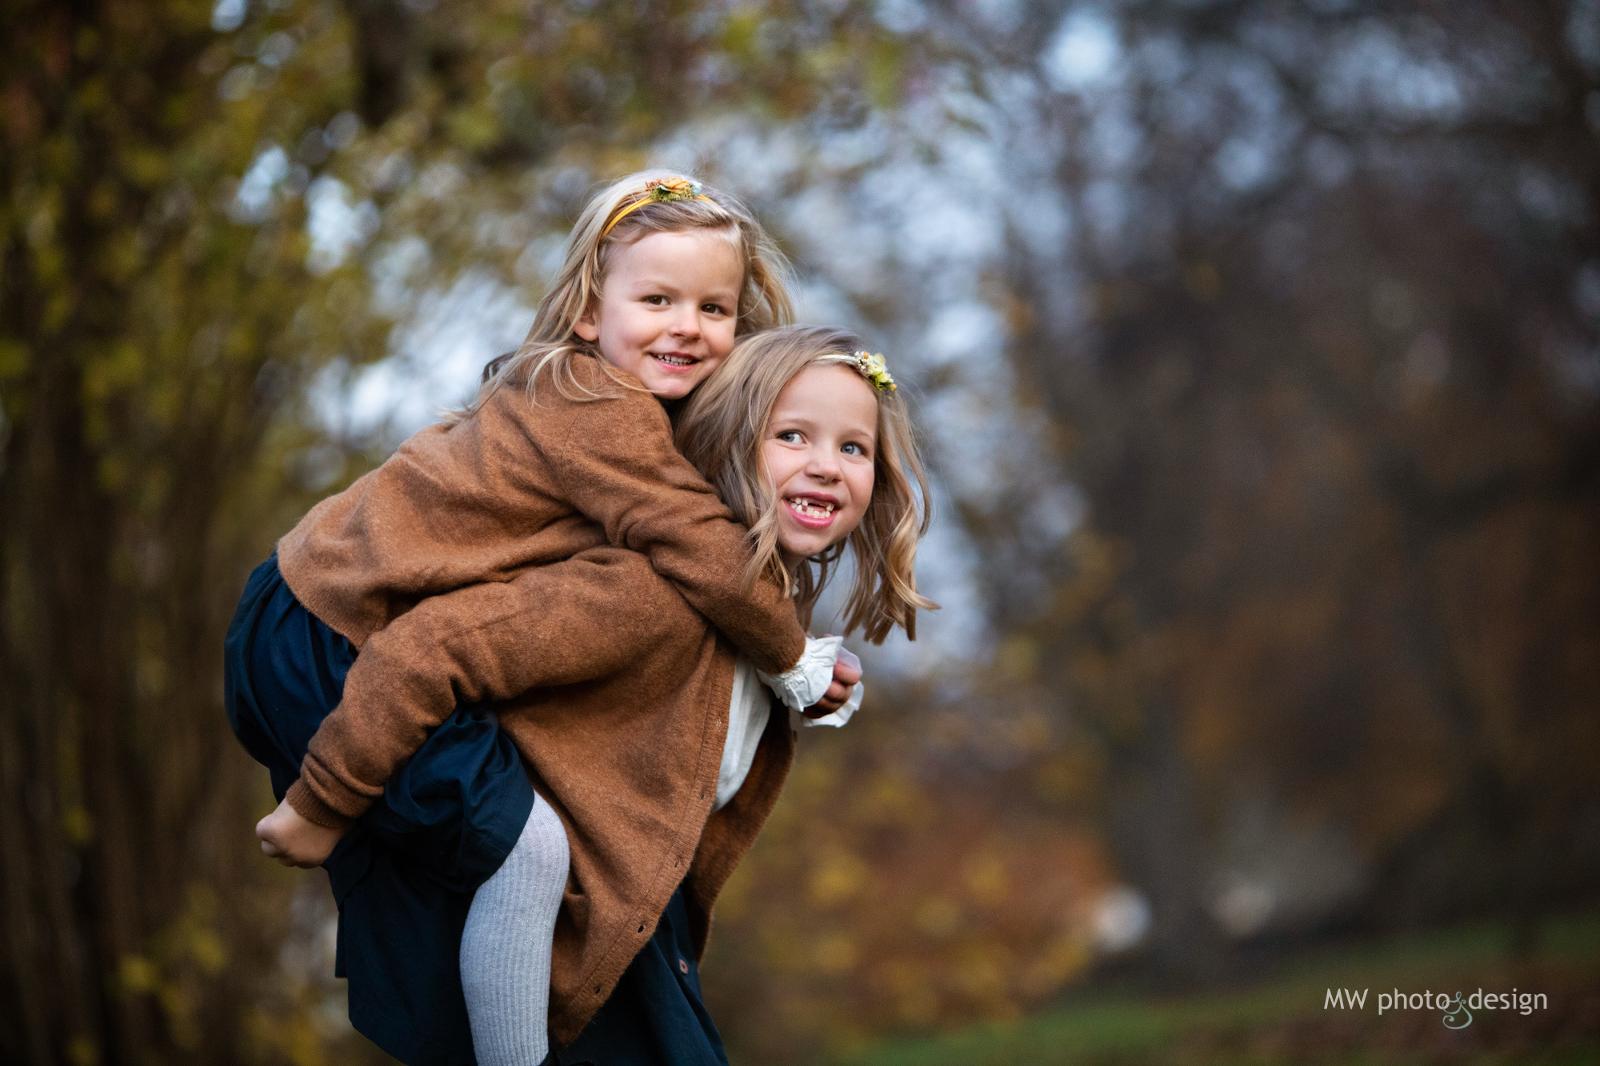 Brunnsparken, barnfotografering, barnfotograf, familjefotograf, fotograf i helsingborg, fotograf i Skåne, fotograf i ramlösa, mw photo&design, marie Walther, porträttfotograf, studiofotografering